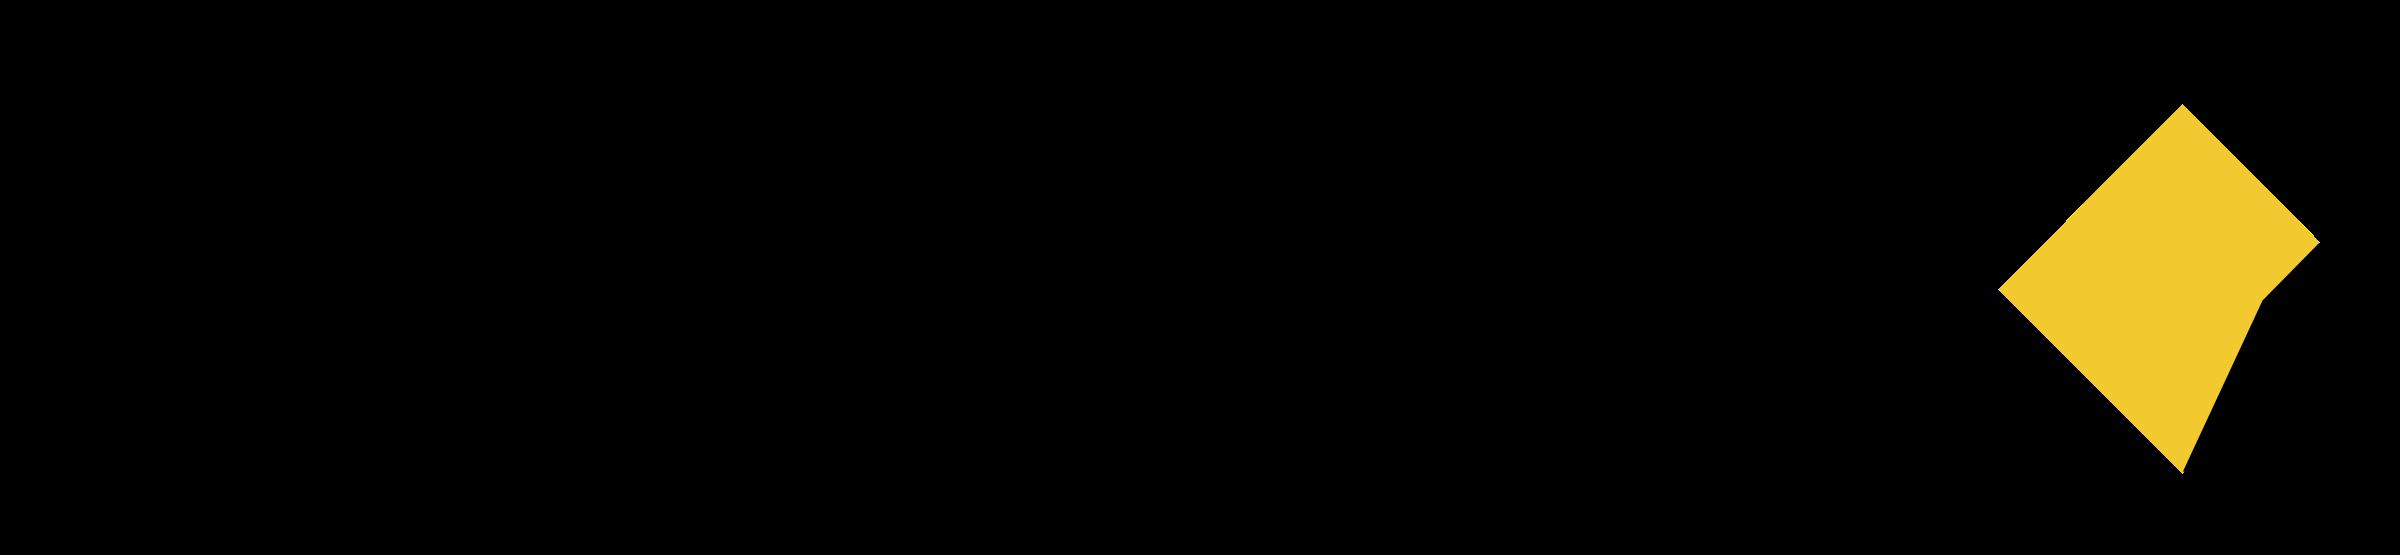 common wealth bank logo on deals mortgage broker